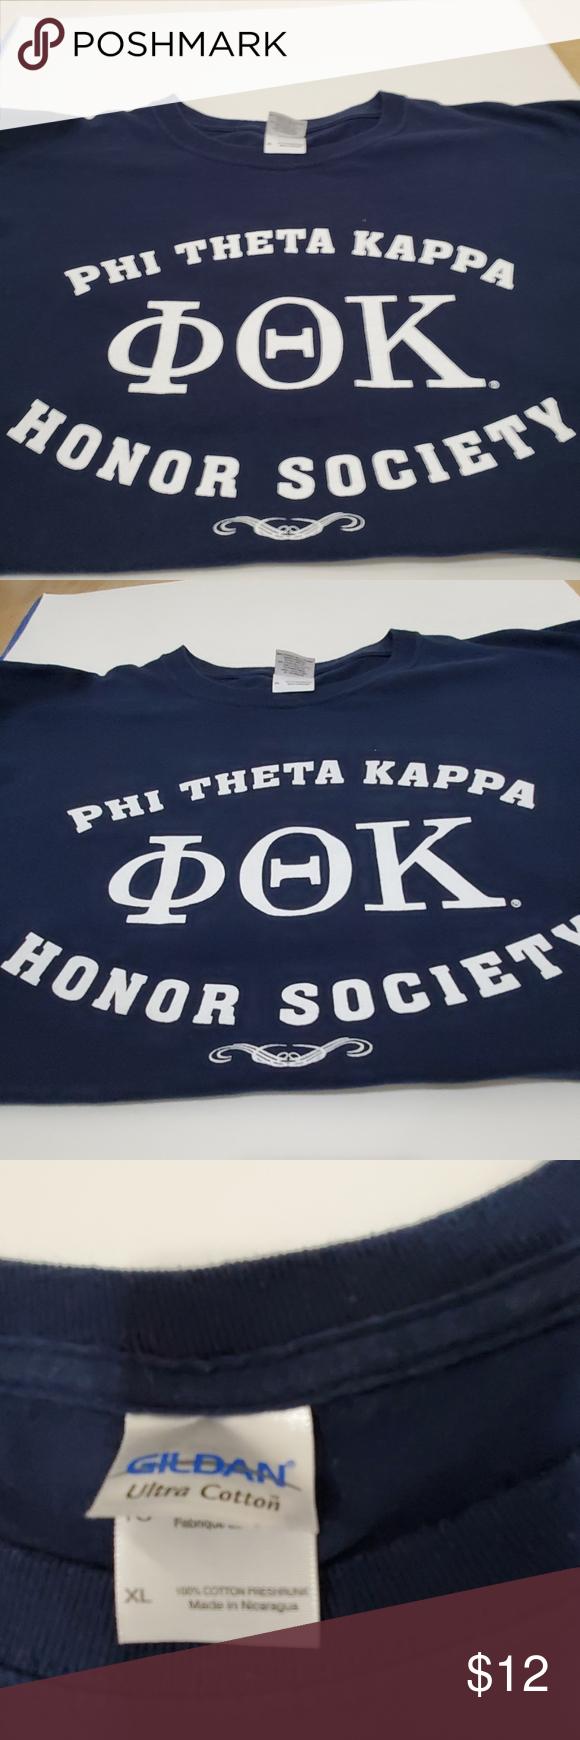 Unisex Phi Theta Kappa Honor Society T Shirt Phi Theta Kappa Honor Society Kappa